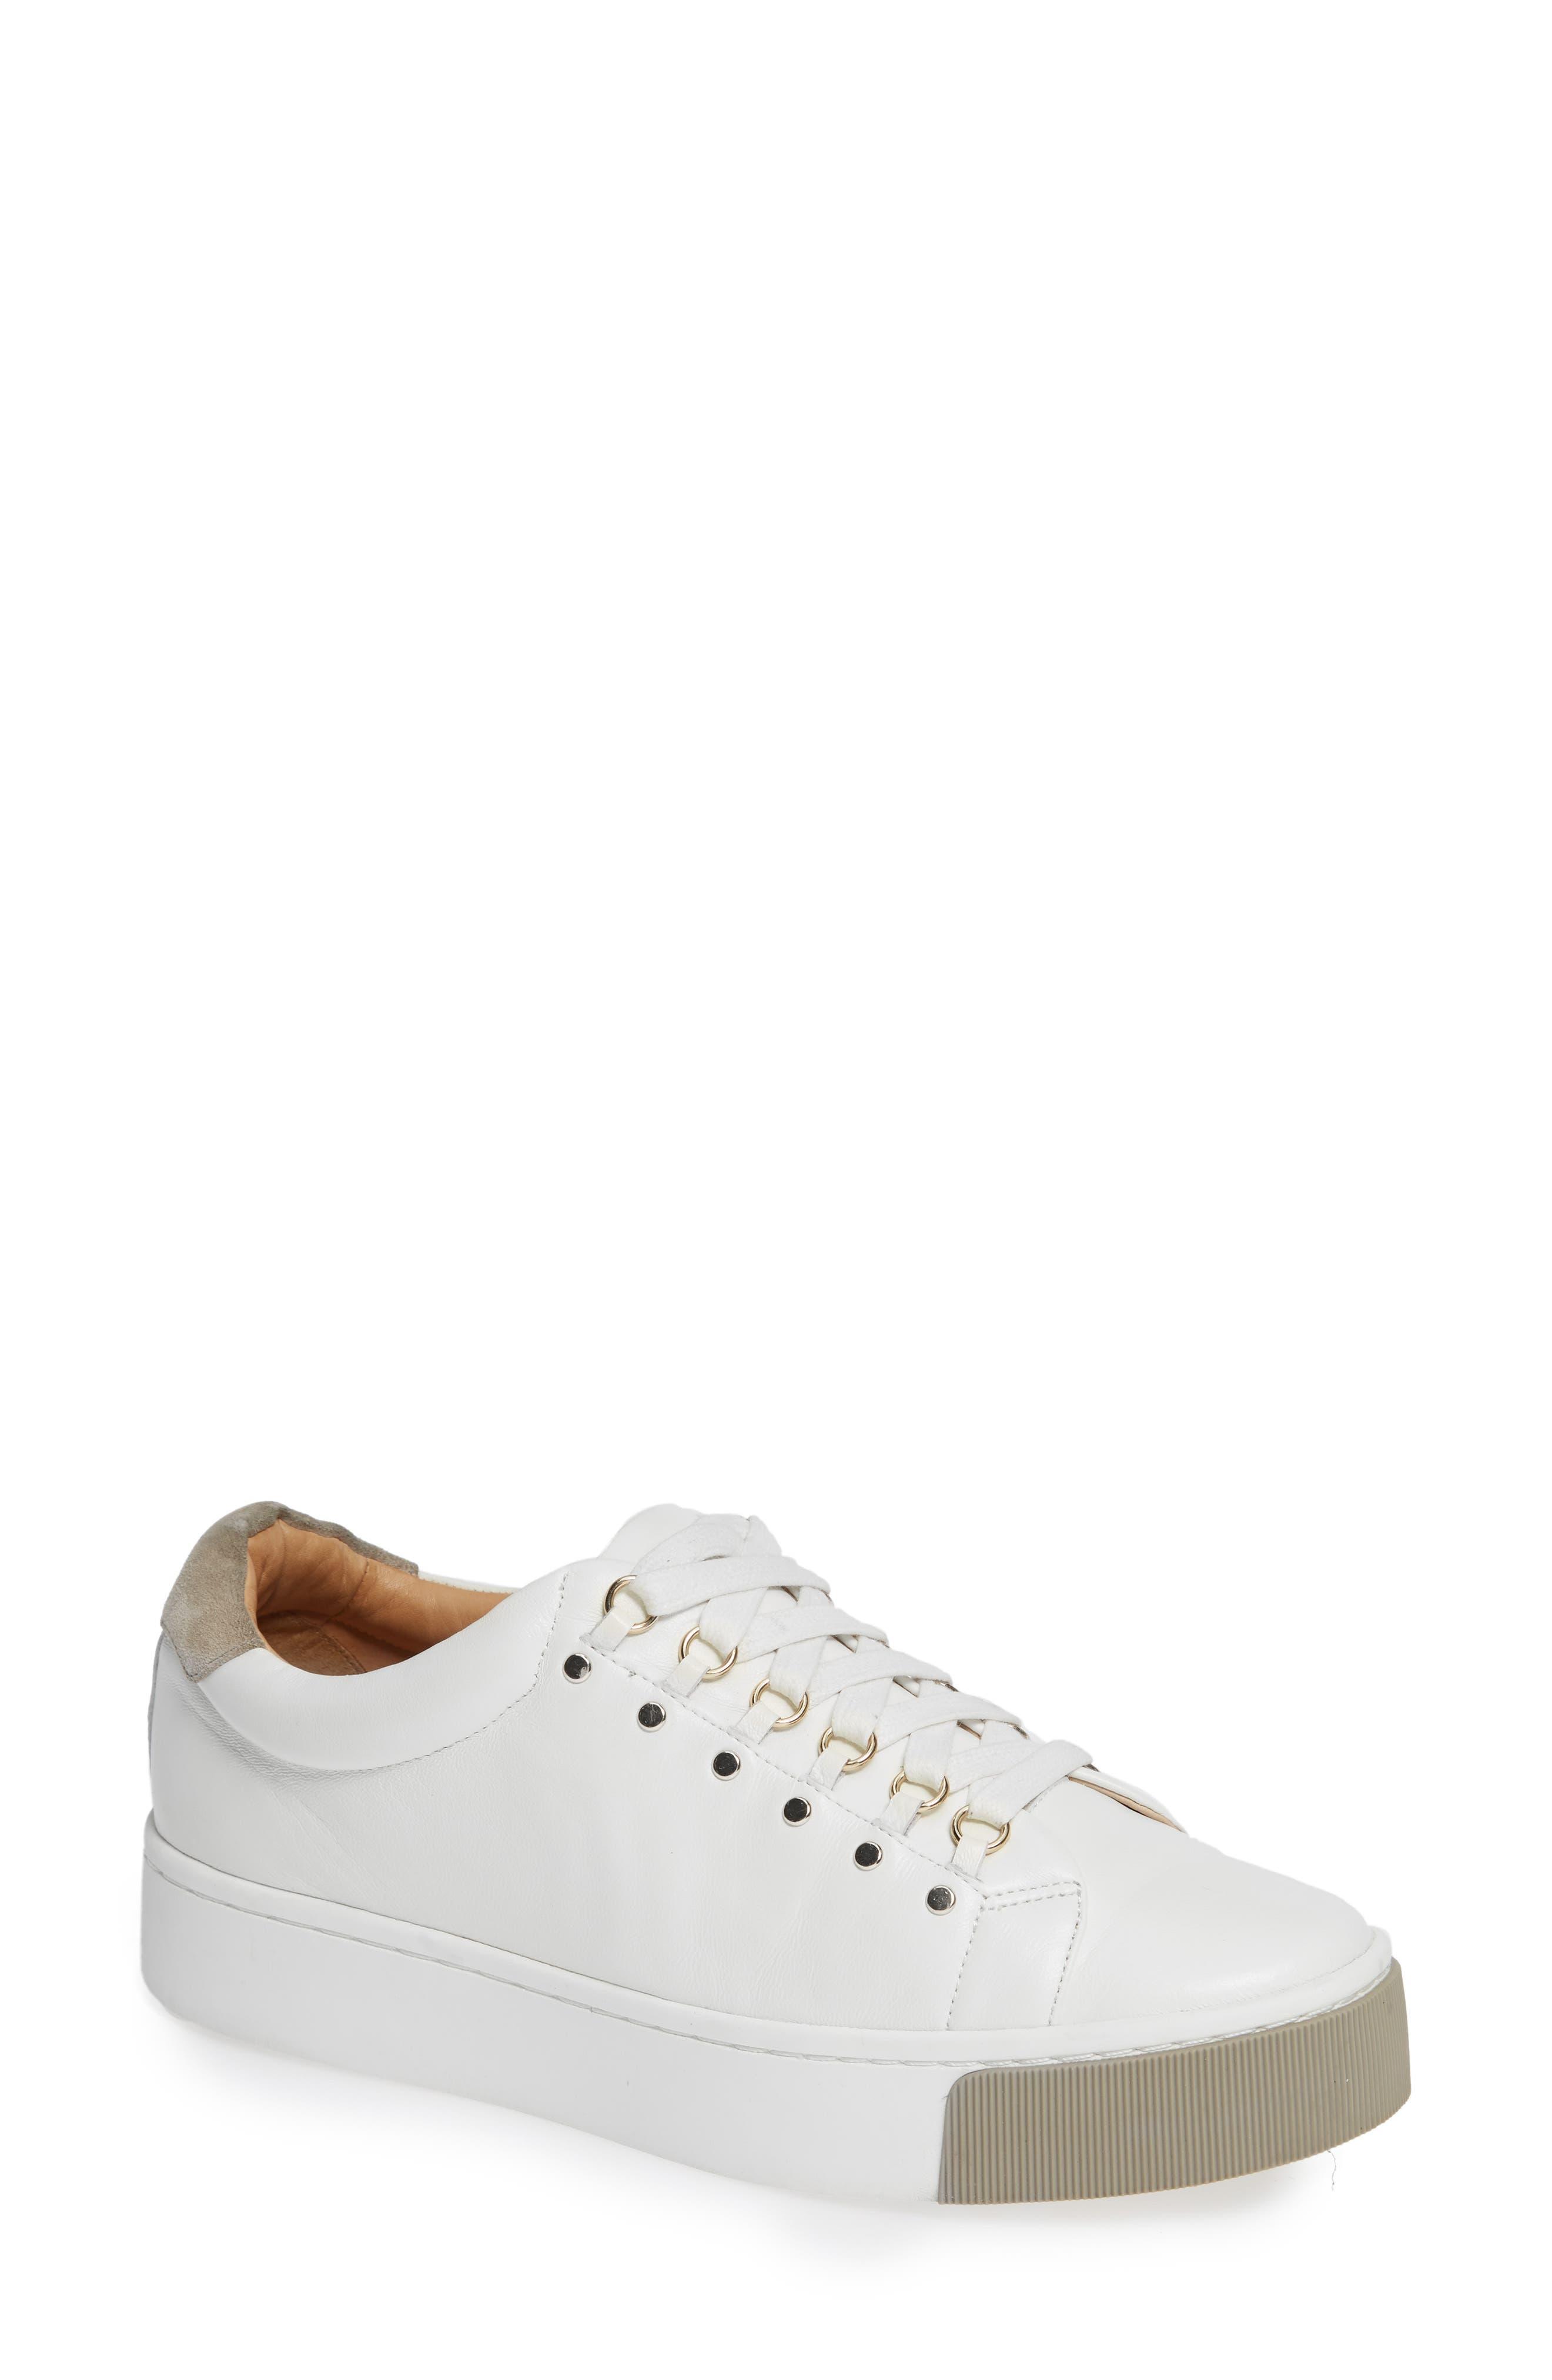 Handan Lace-Up Sneaker,                             Main thumbnail 1, color,                             WHITE